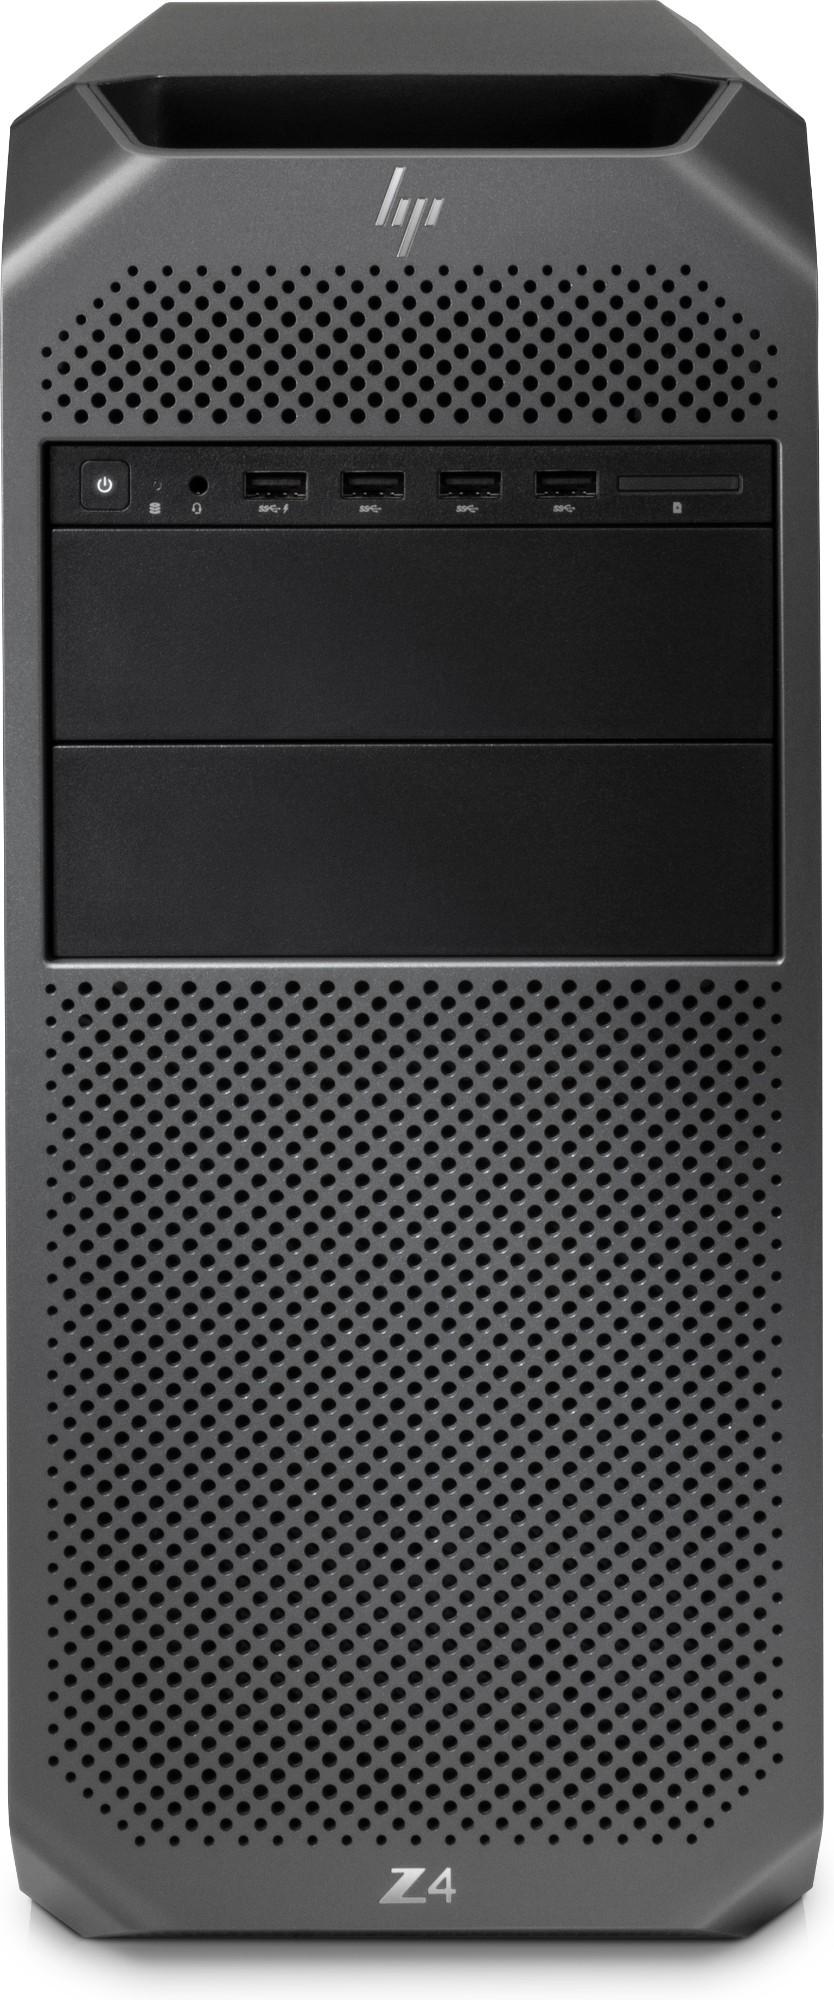 HP Z4 G4 Intel Xeon W W-2223 16 GB DDR4-SDRAM 1256 GB HDD+SSD Tower Black Workstation Windows 10 Pro